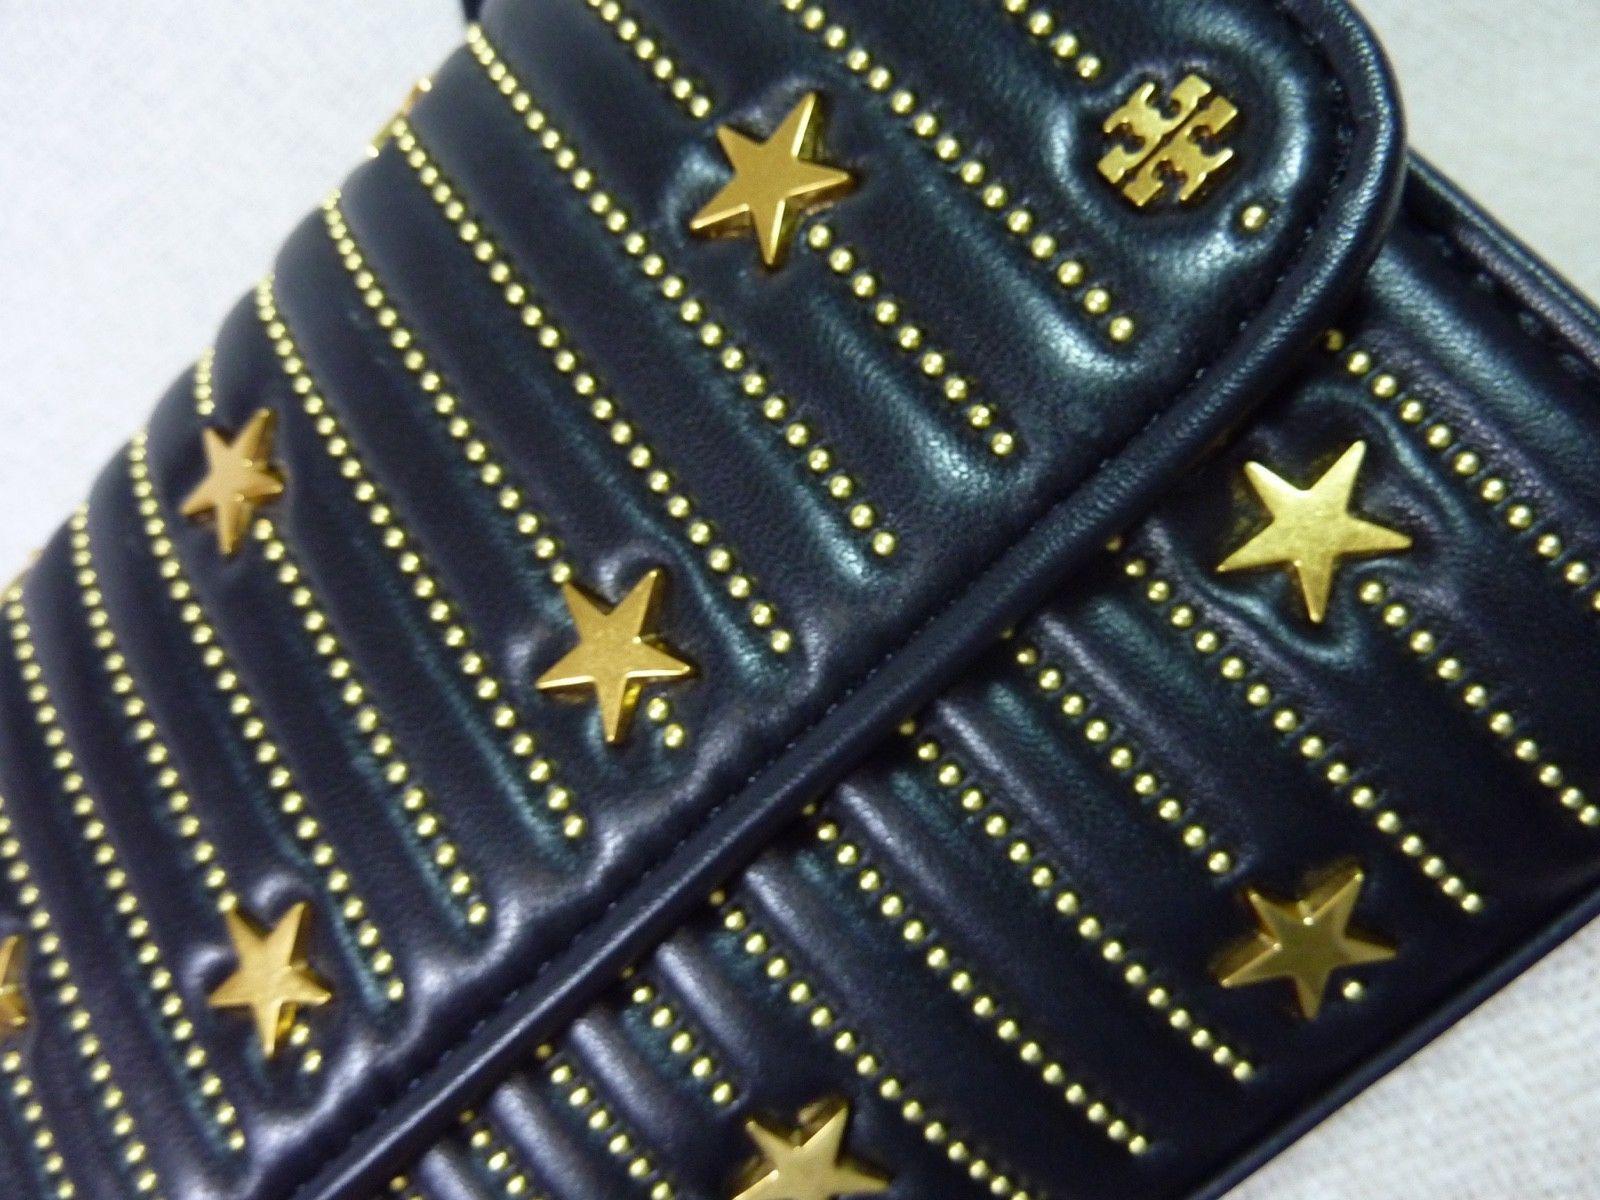 NWT Tory Burch Black Fleming Star-Stud Small Convertible Bag image 7